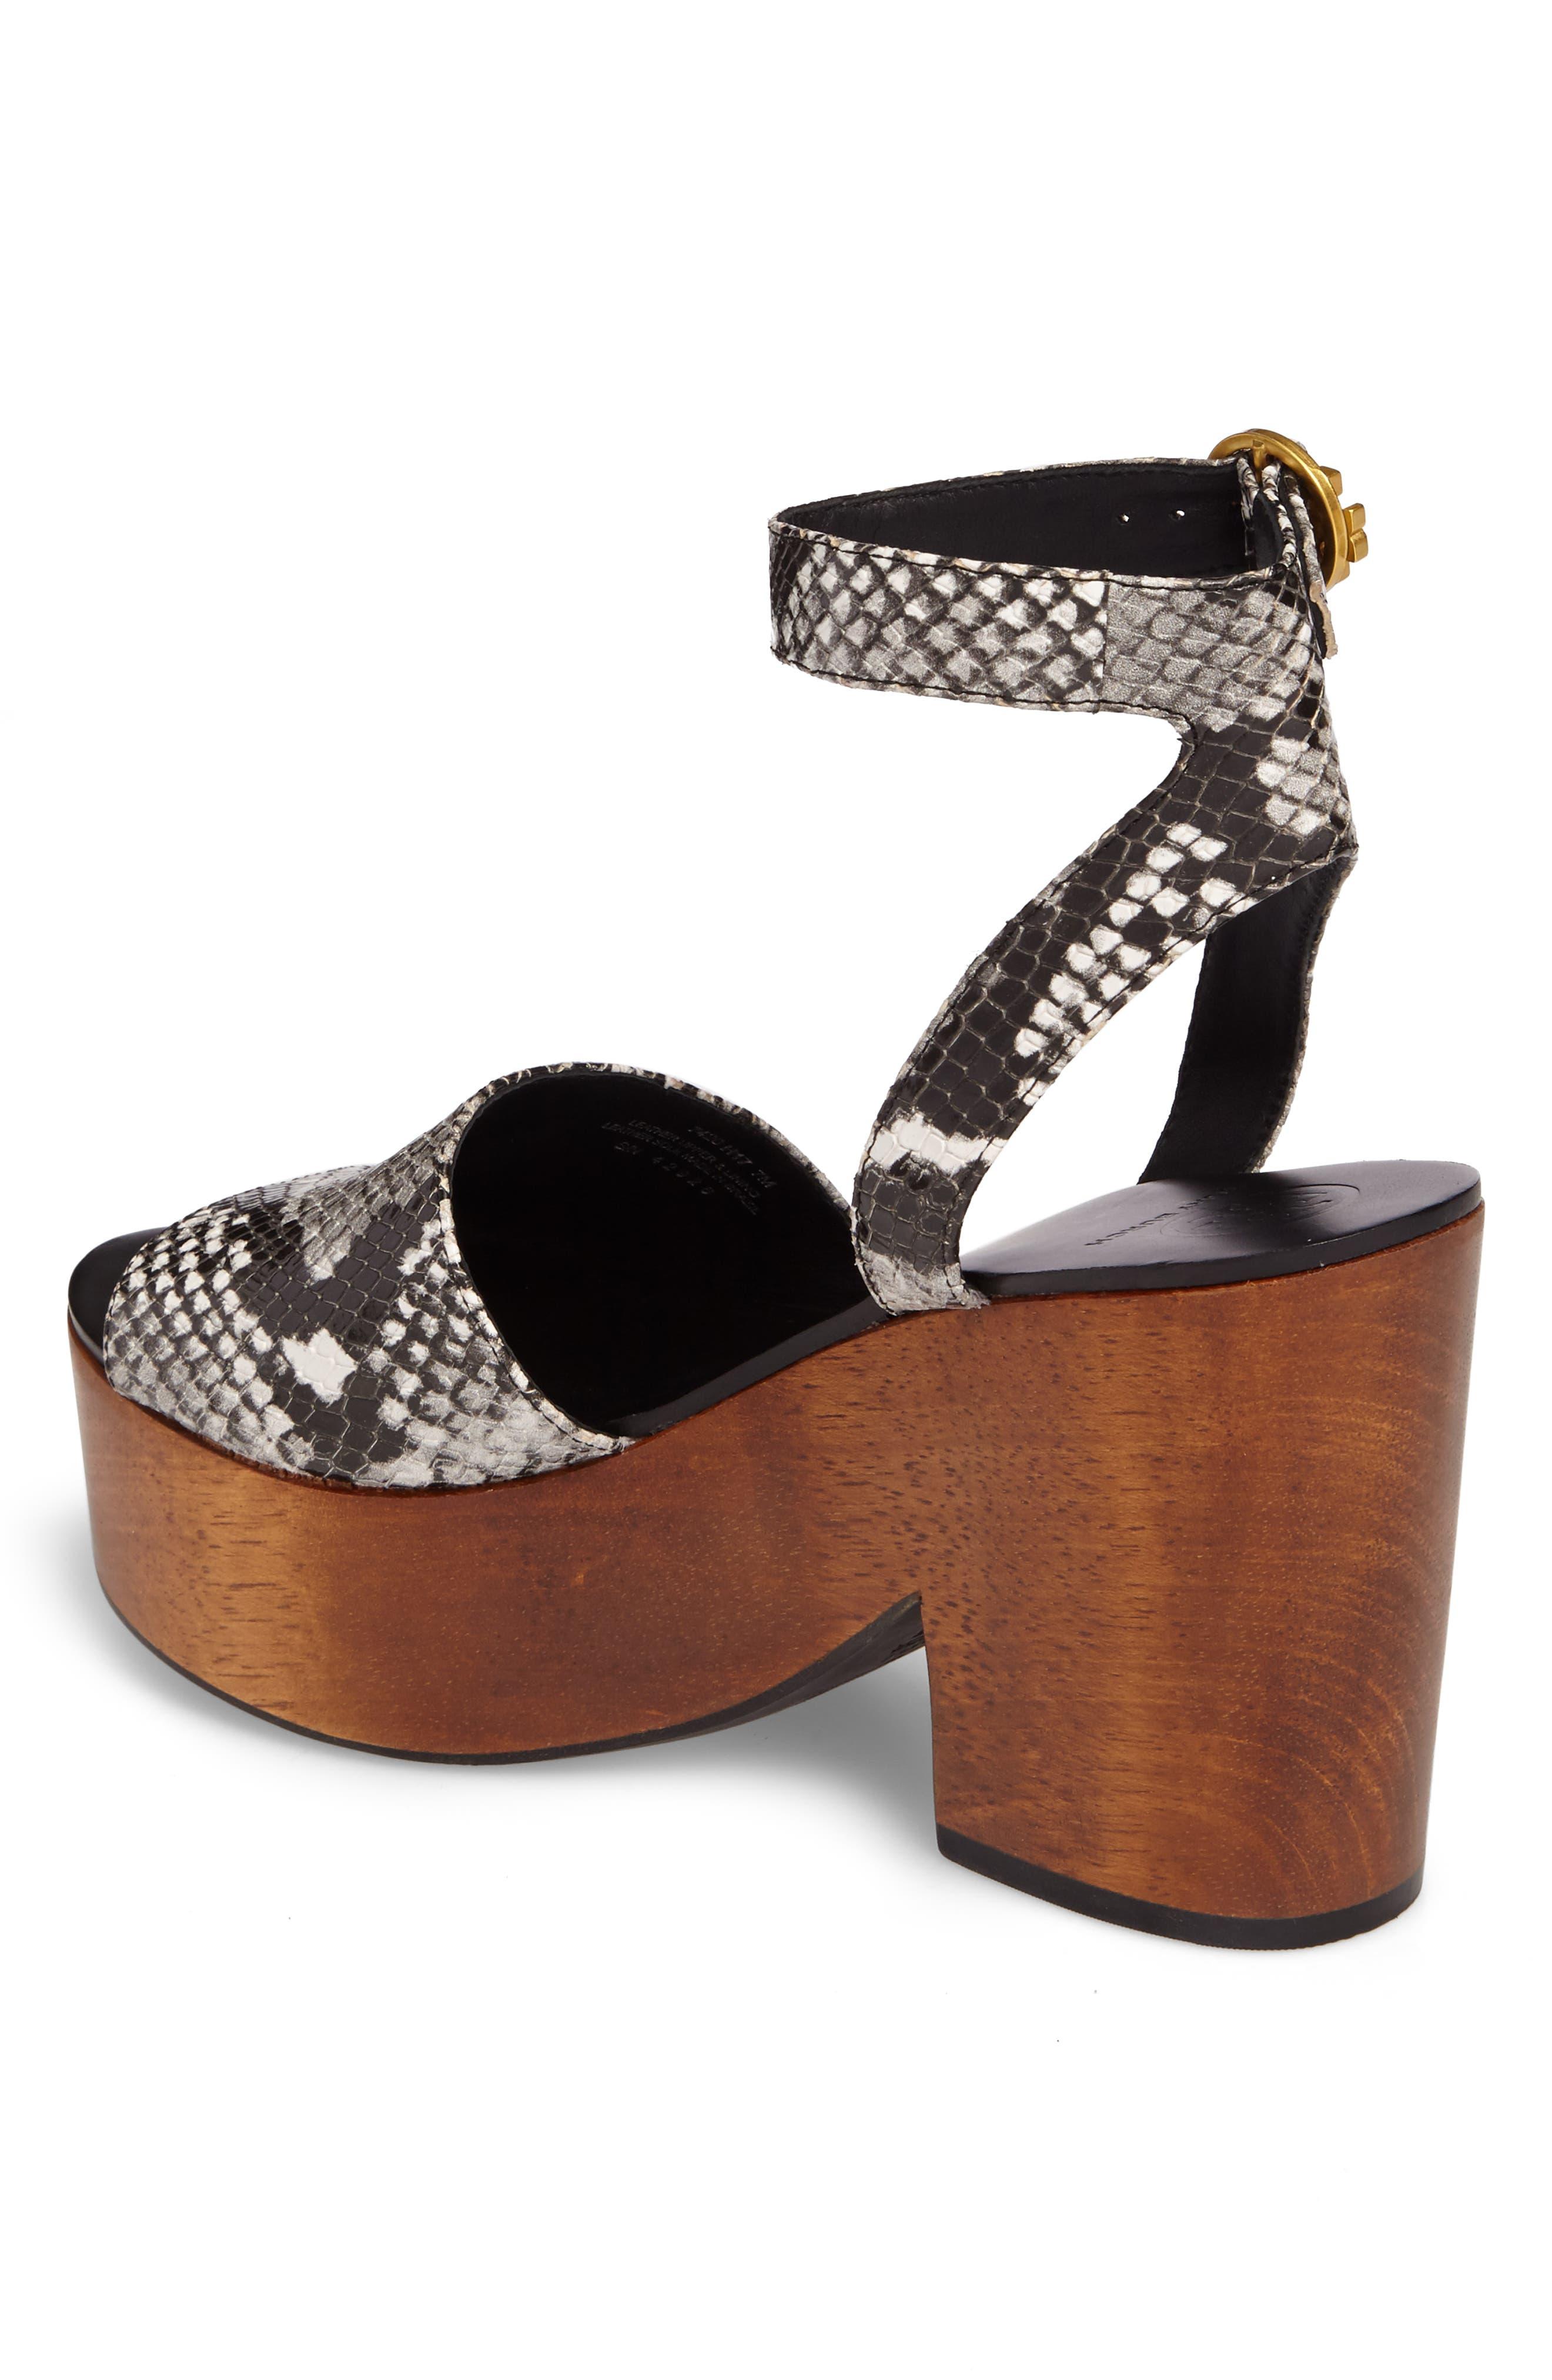 Camilla Platform Sandal,                             Alternate thumbnail 2, color,                             Roccia Black/ White